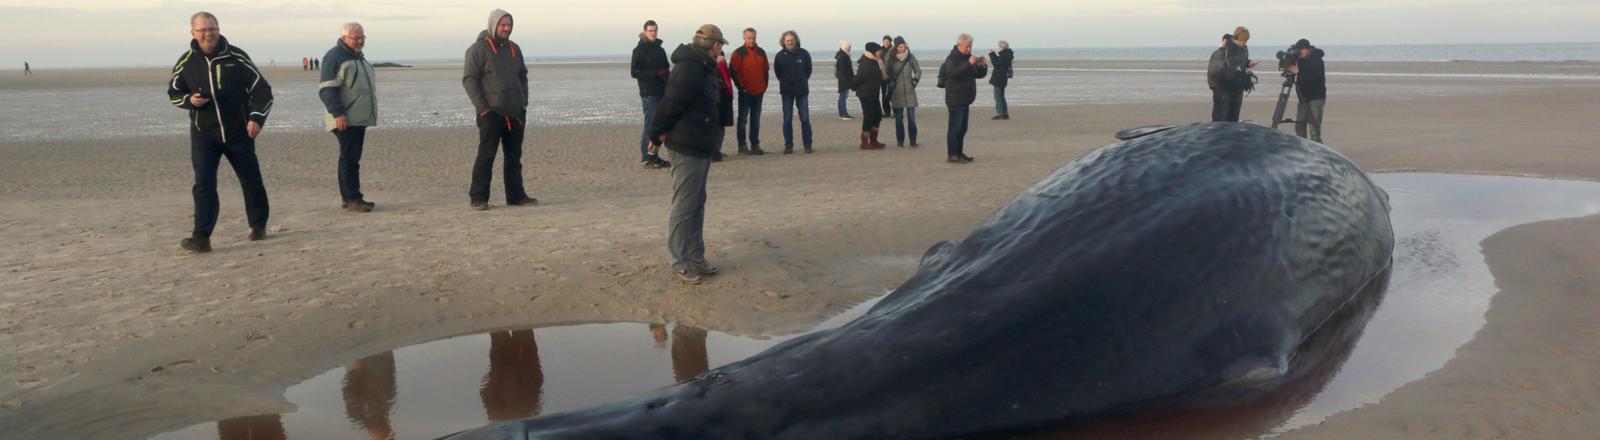 Toter Pottwal am Strand von Wangerooge